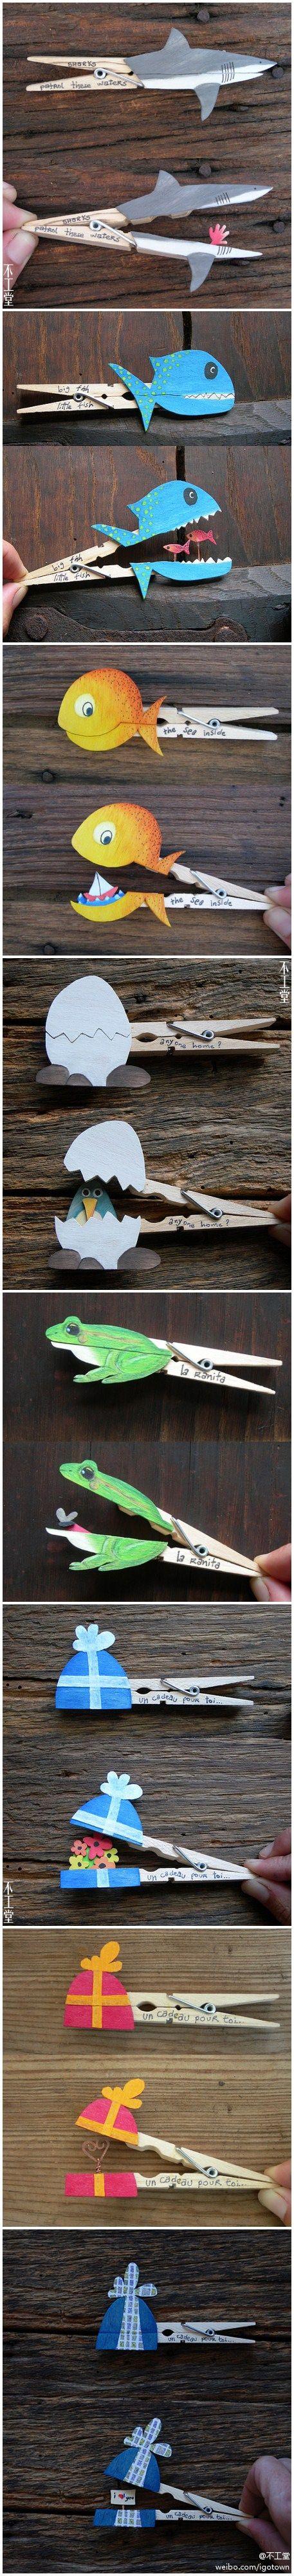 Fun kids craft!  Or adult craft??...